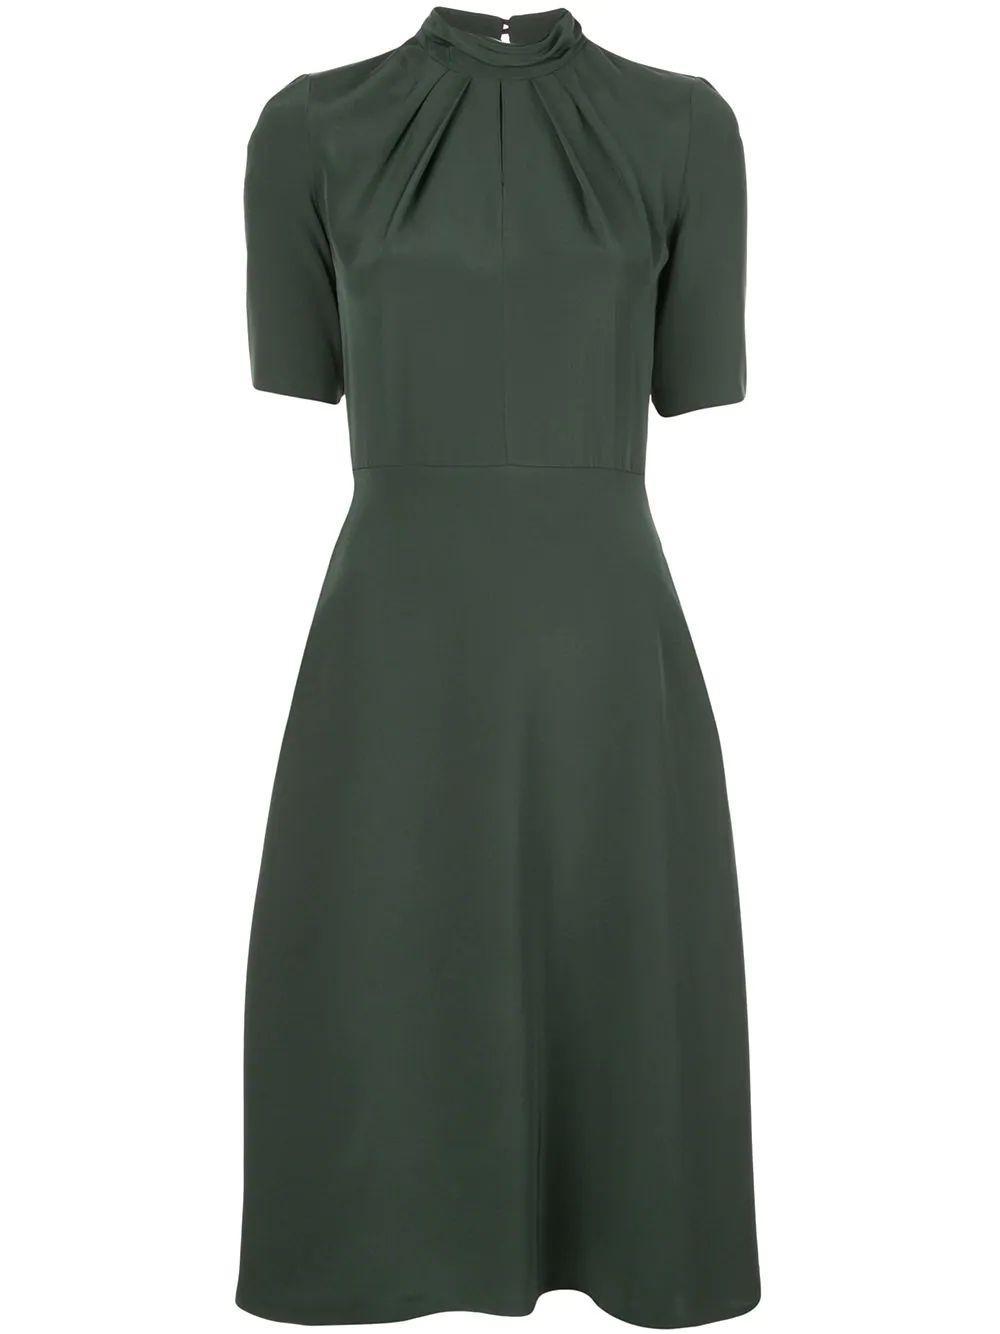 Elbow Sleeve Crepe Twist Neck Dress Item # R20723SB